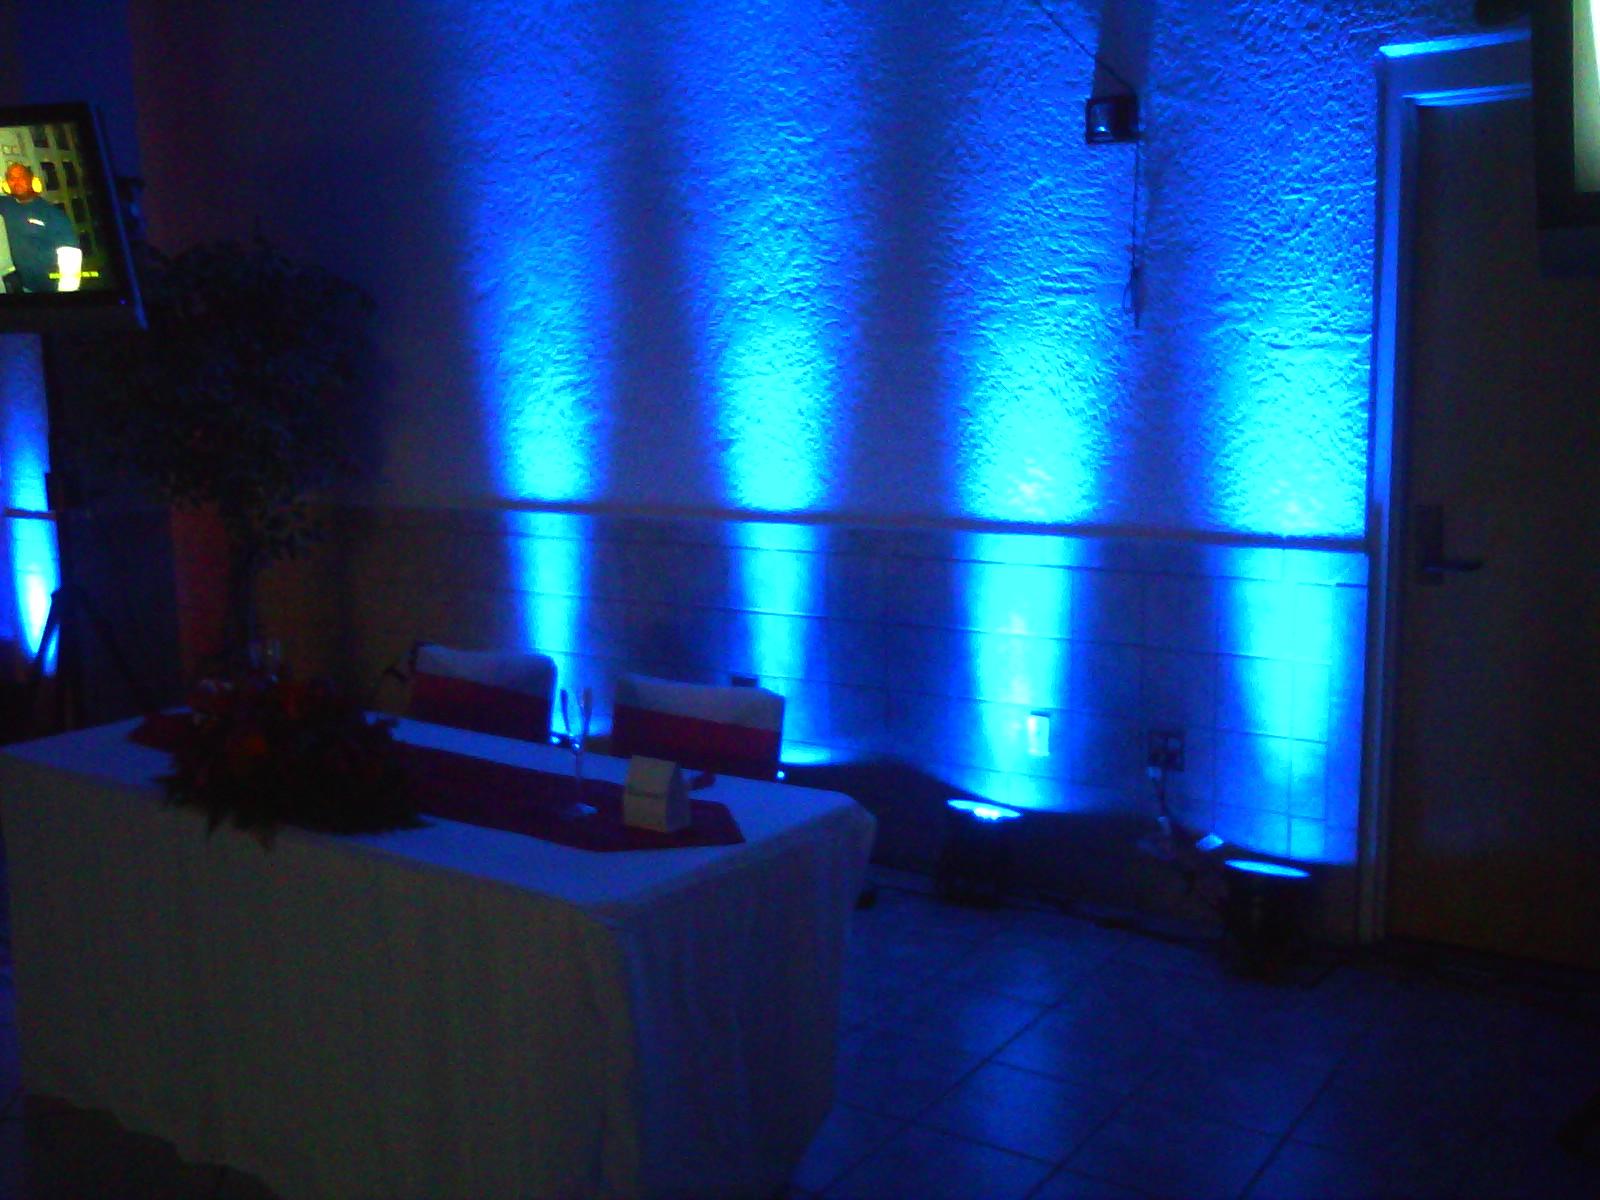 outdoor-light-led-lighting-feature-light-home-lighting-track-lighting-led-party-lights-outdoor-mini-led-party-lightsled-music-party-lightsbattery-mini-led-party-lightsmulti-color-led-party-lig.jpg